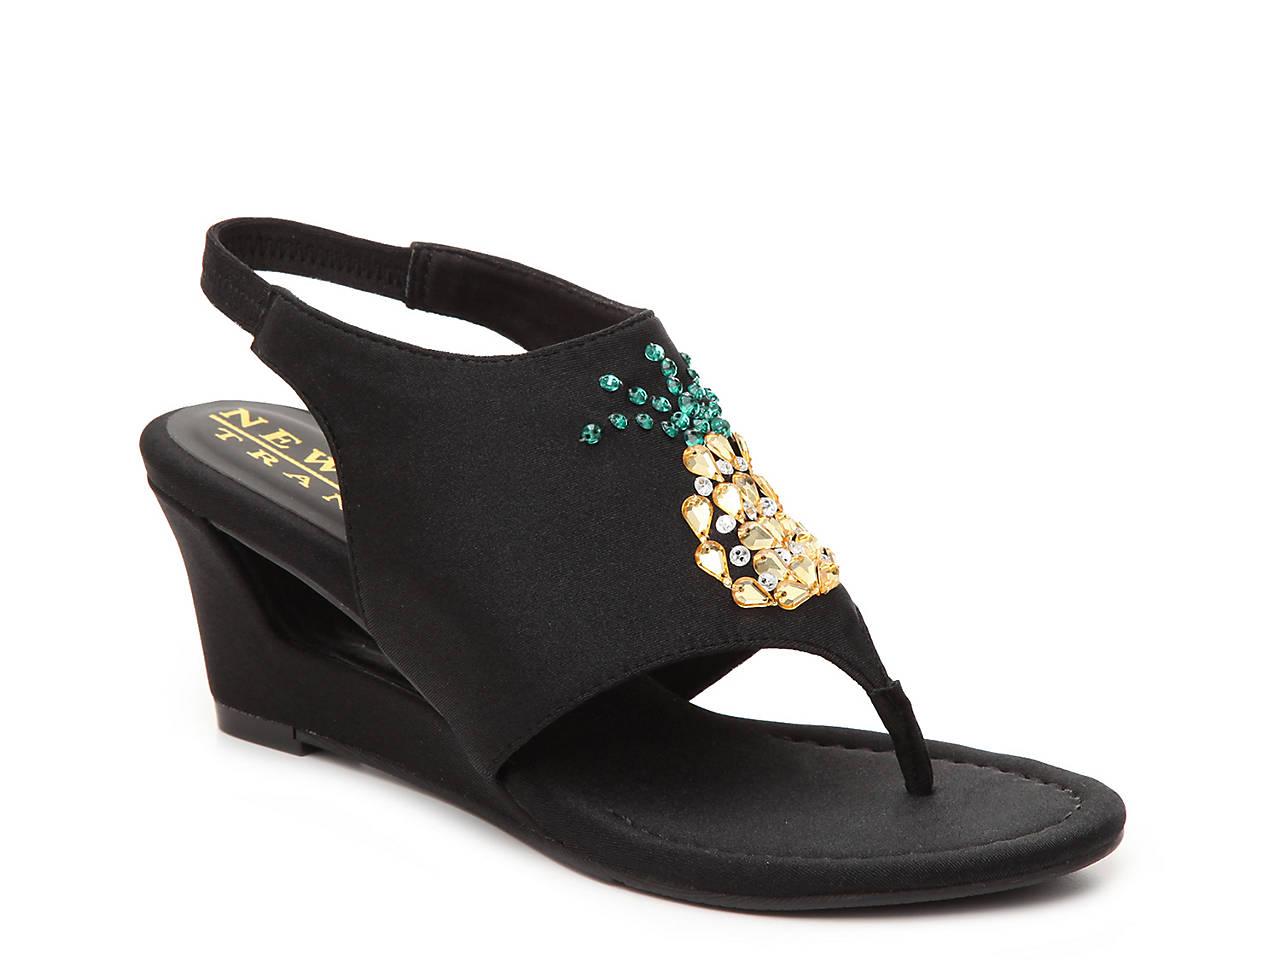 d0271dd16 New York Transit Fancy Fruit Wedge Sandal Women s Shoes